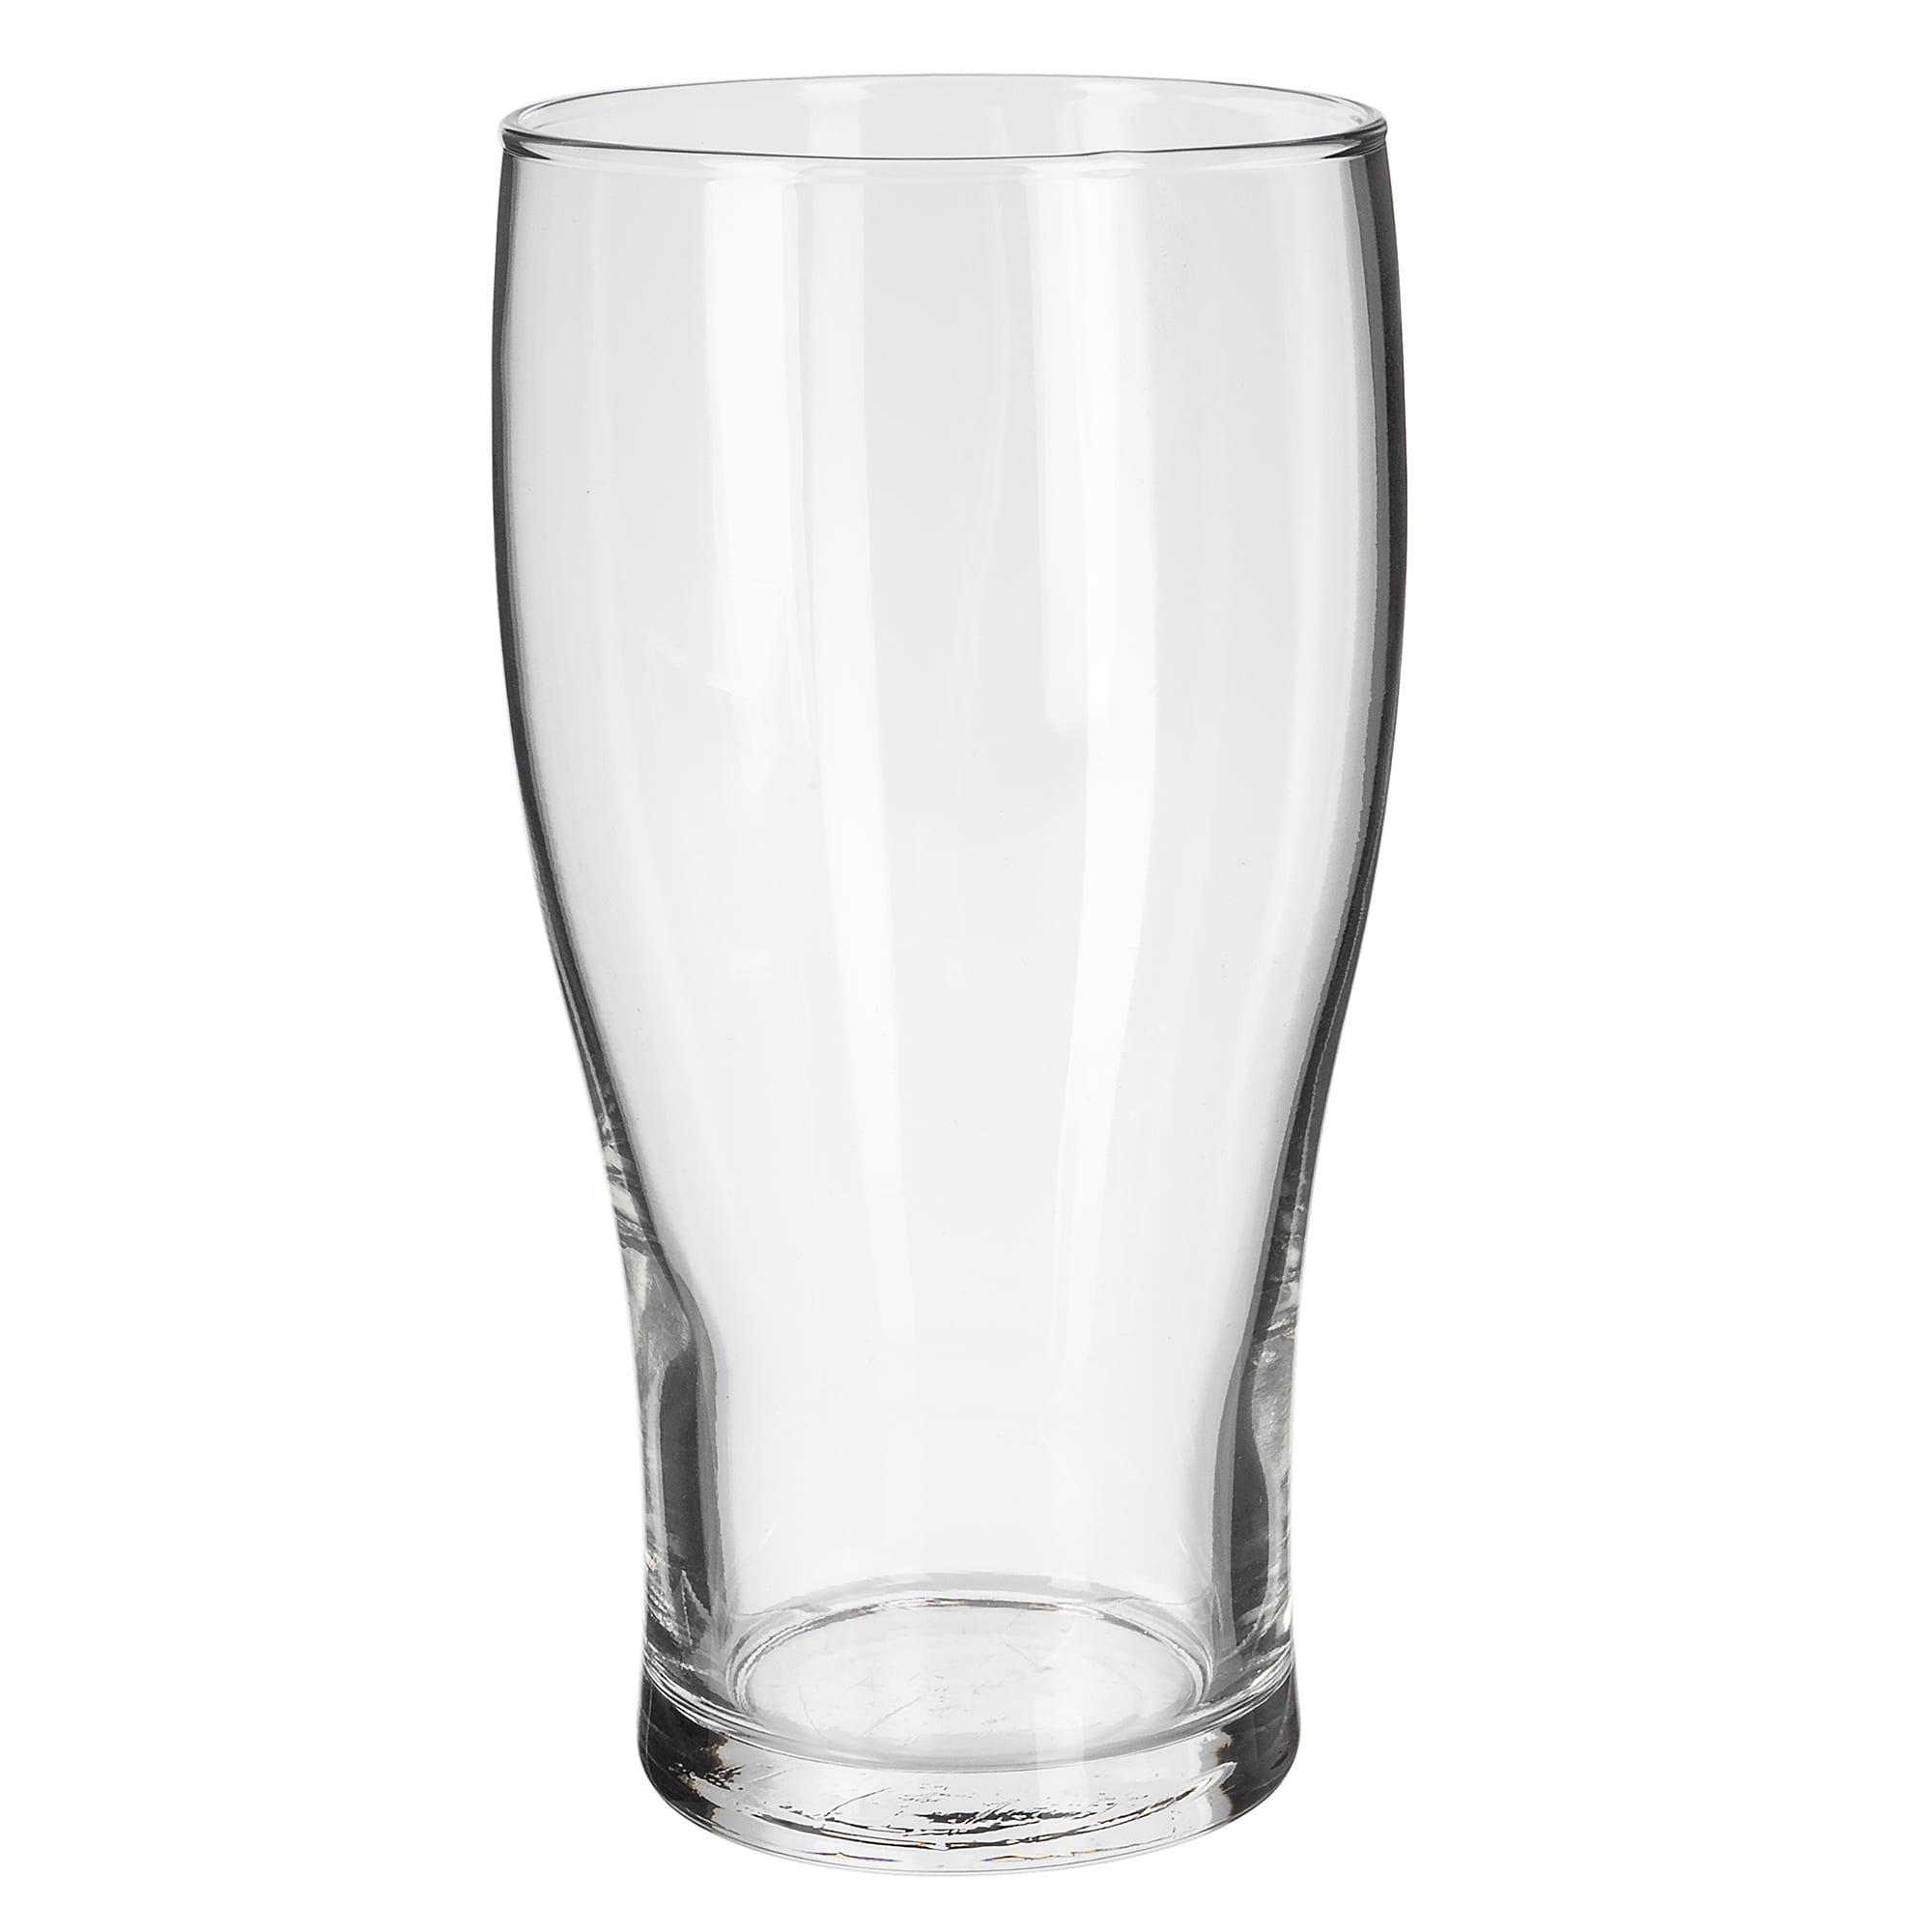 Libbey 4808 16 oz Pub Glass - Safedge Rim Guarantee